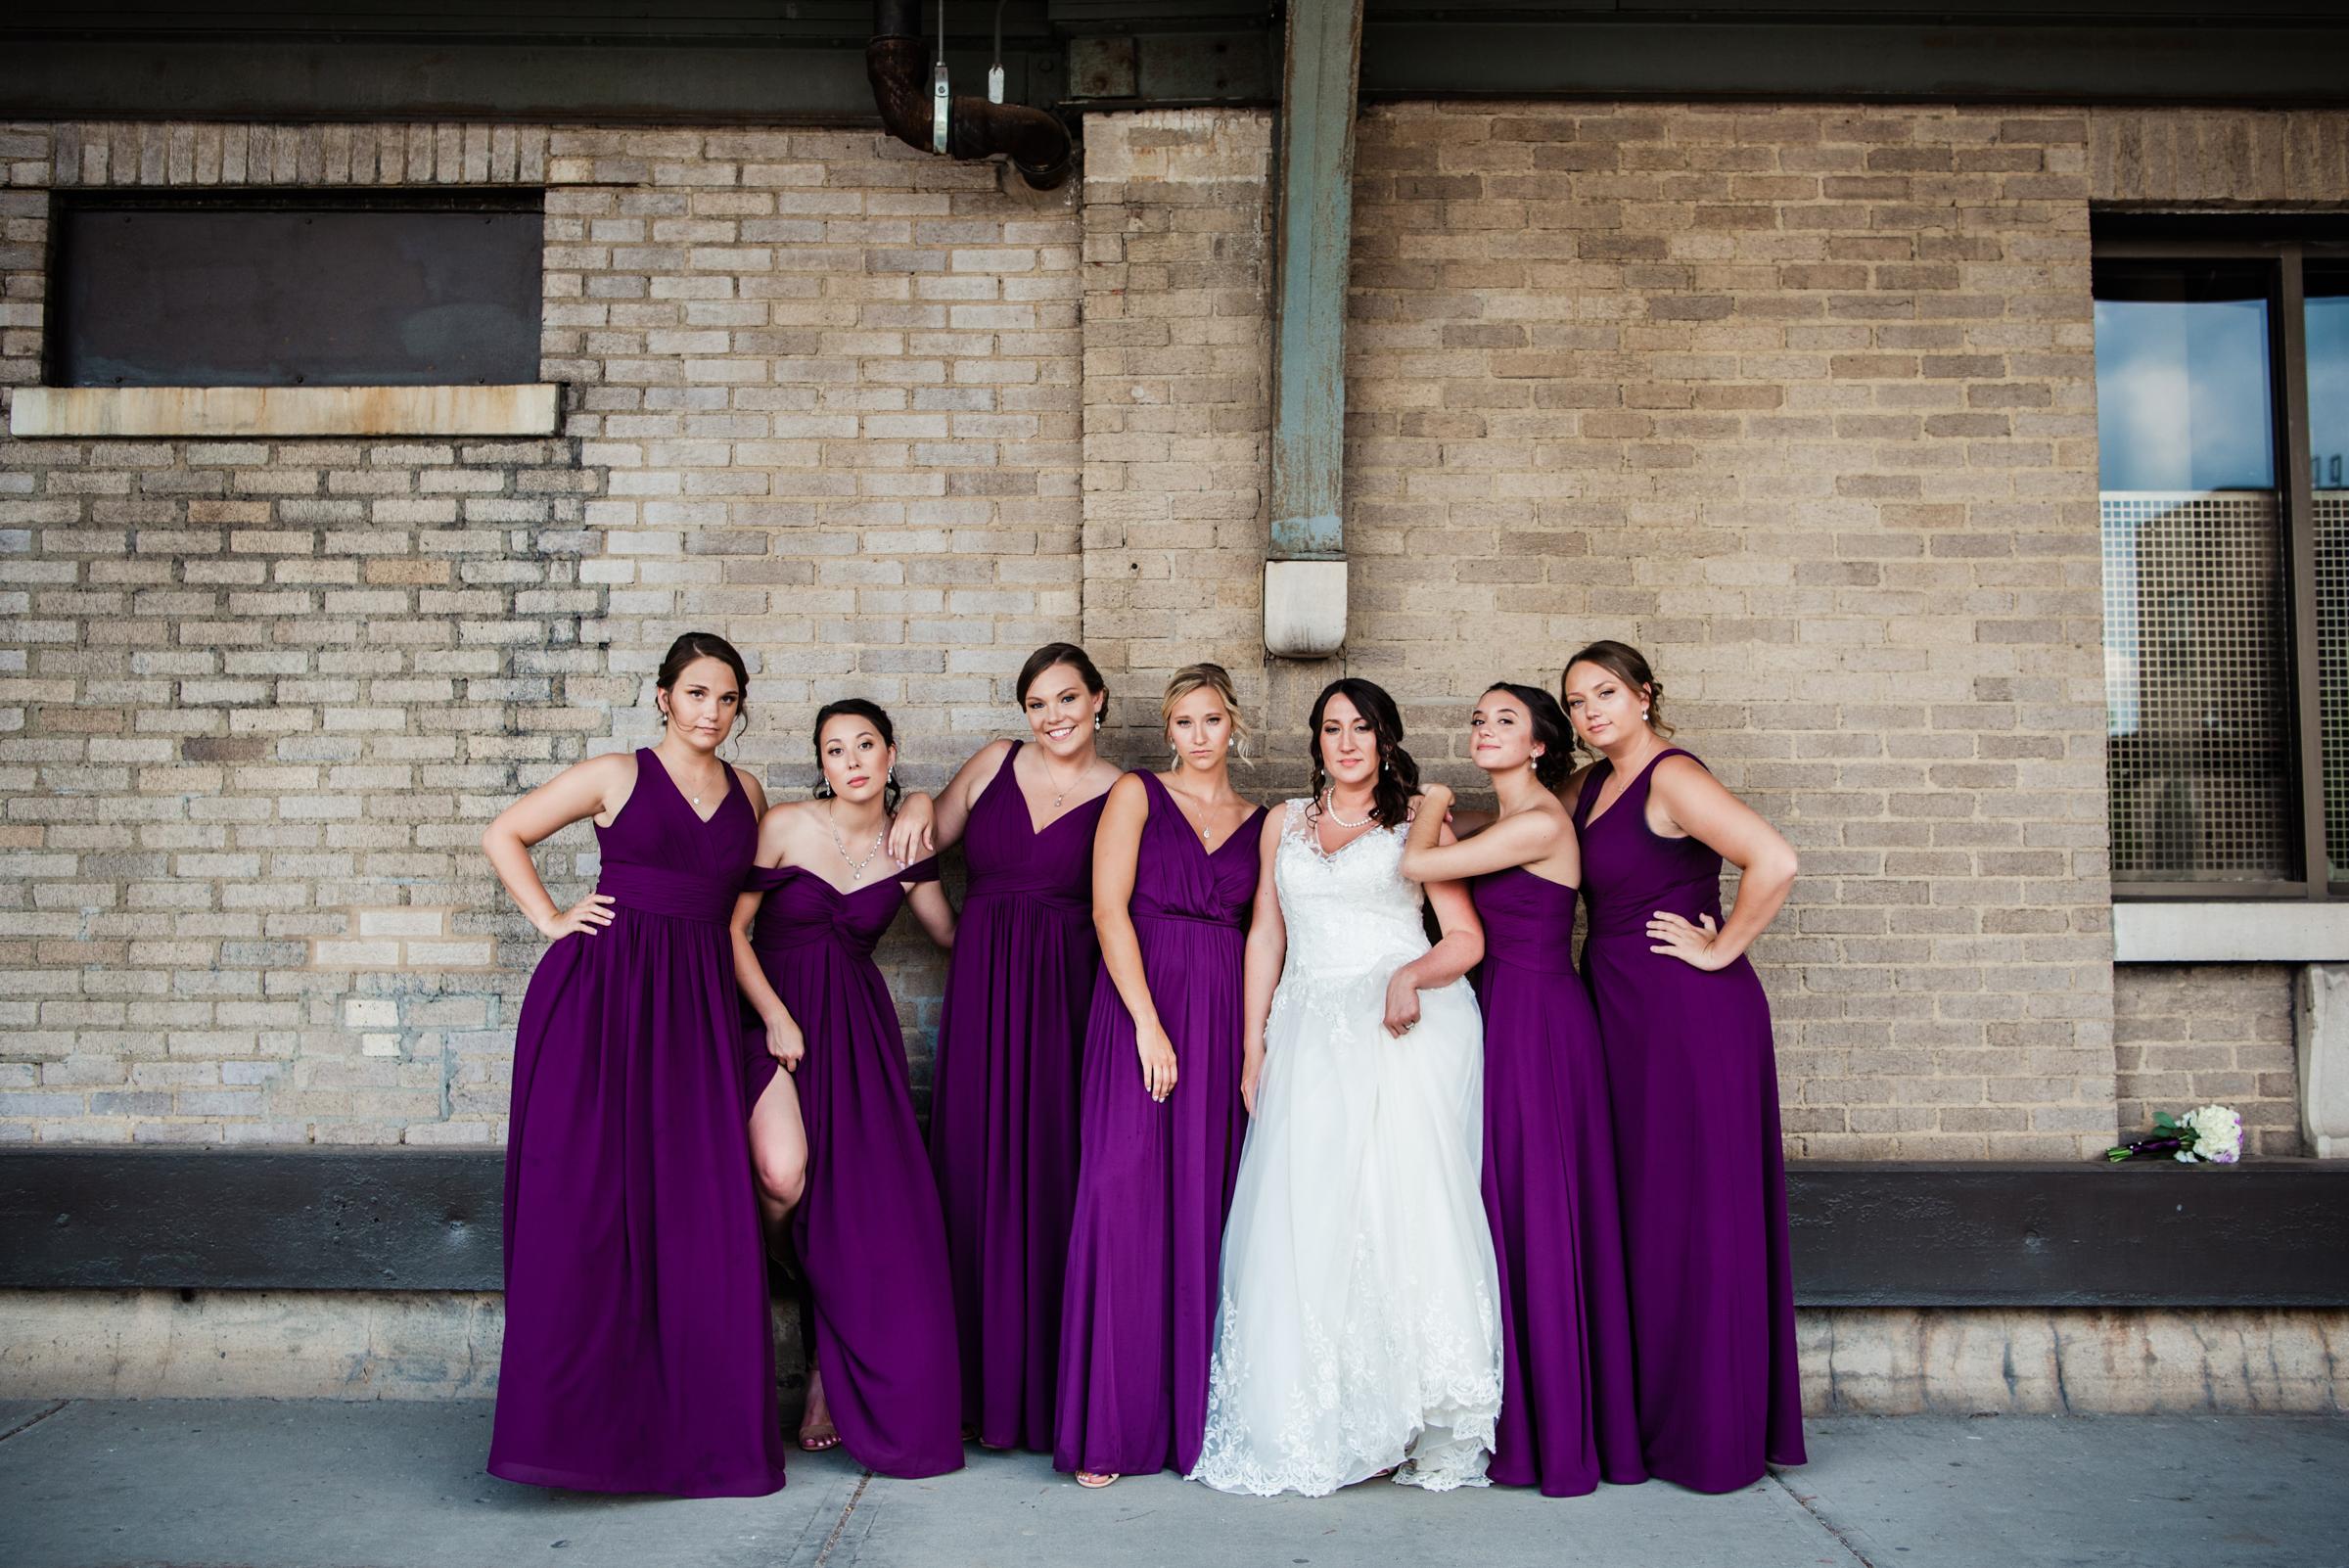 Historic_Old_St_Johns_Church_Valentinos_Banquet_Hall_Central_NY_Wedding_JILL_STUDIO_Rochester_NY_Photographer_DSC_6337.jpg